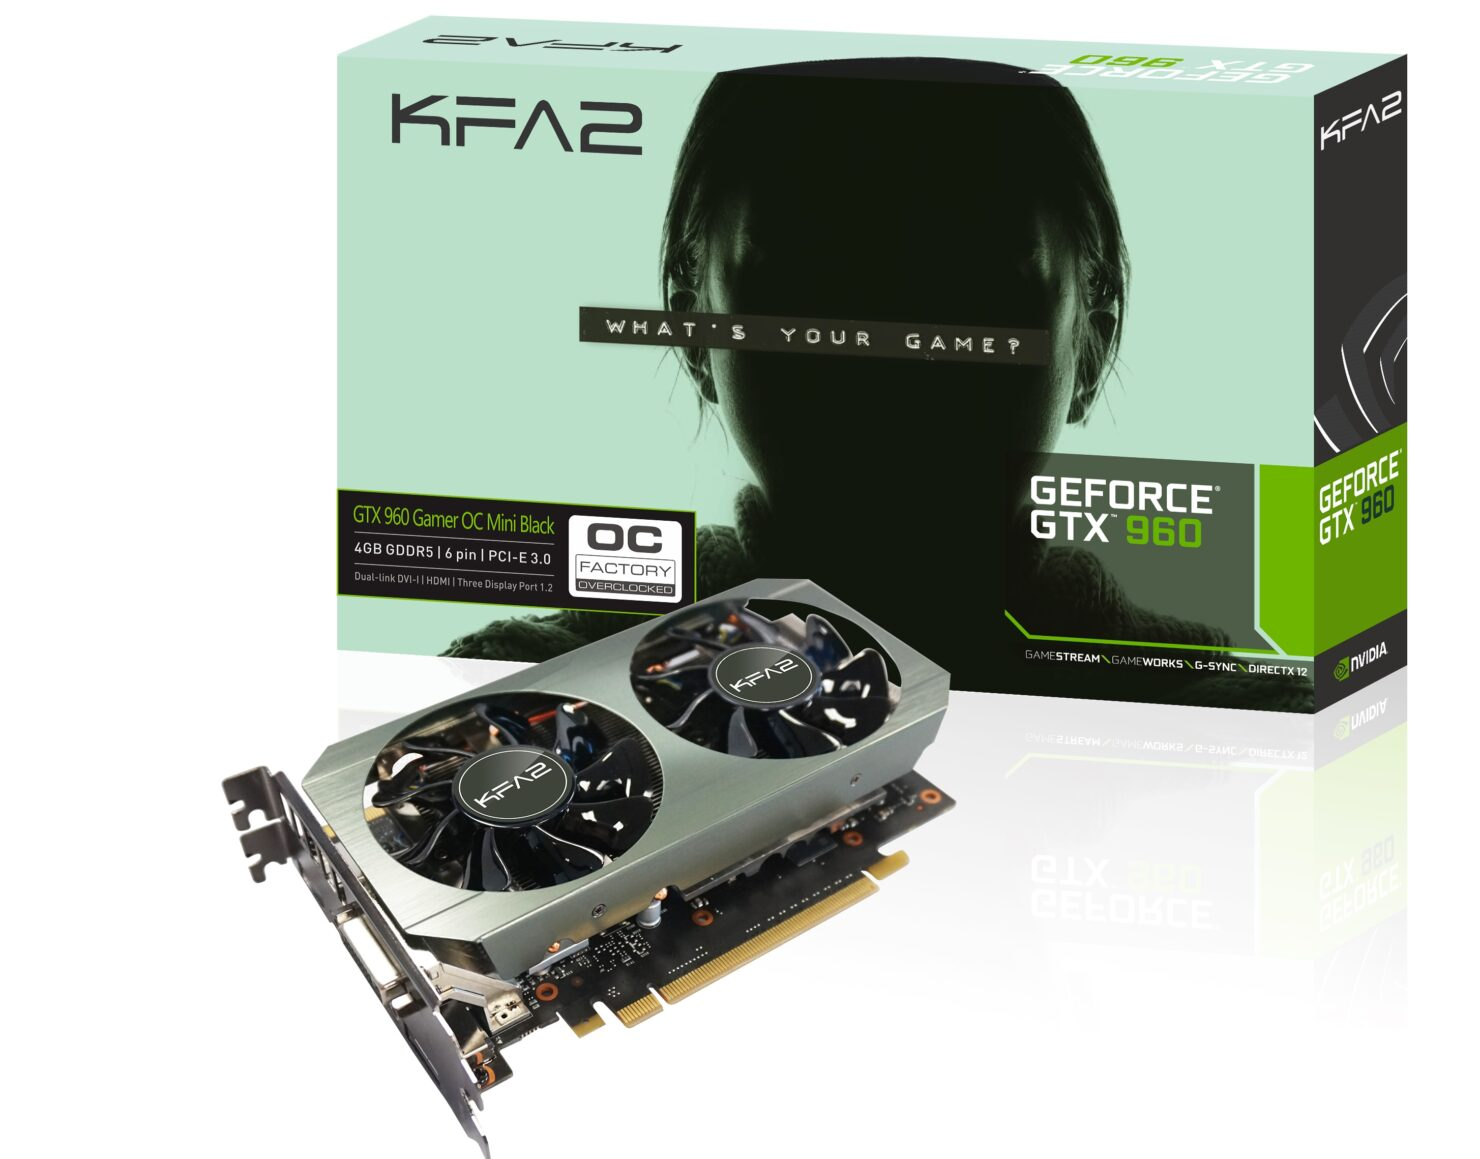 kfa2-gtx960-gamer-oc-boxcard